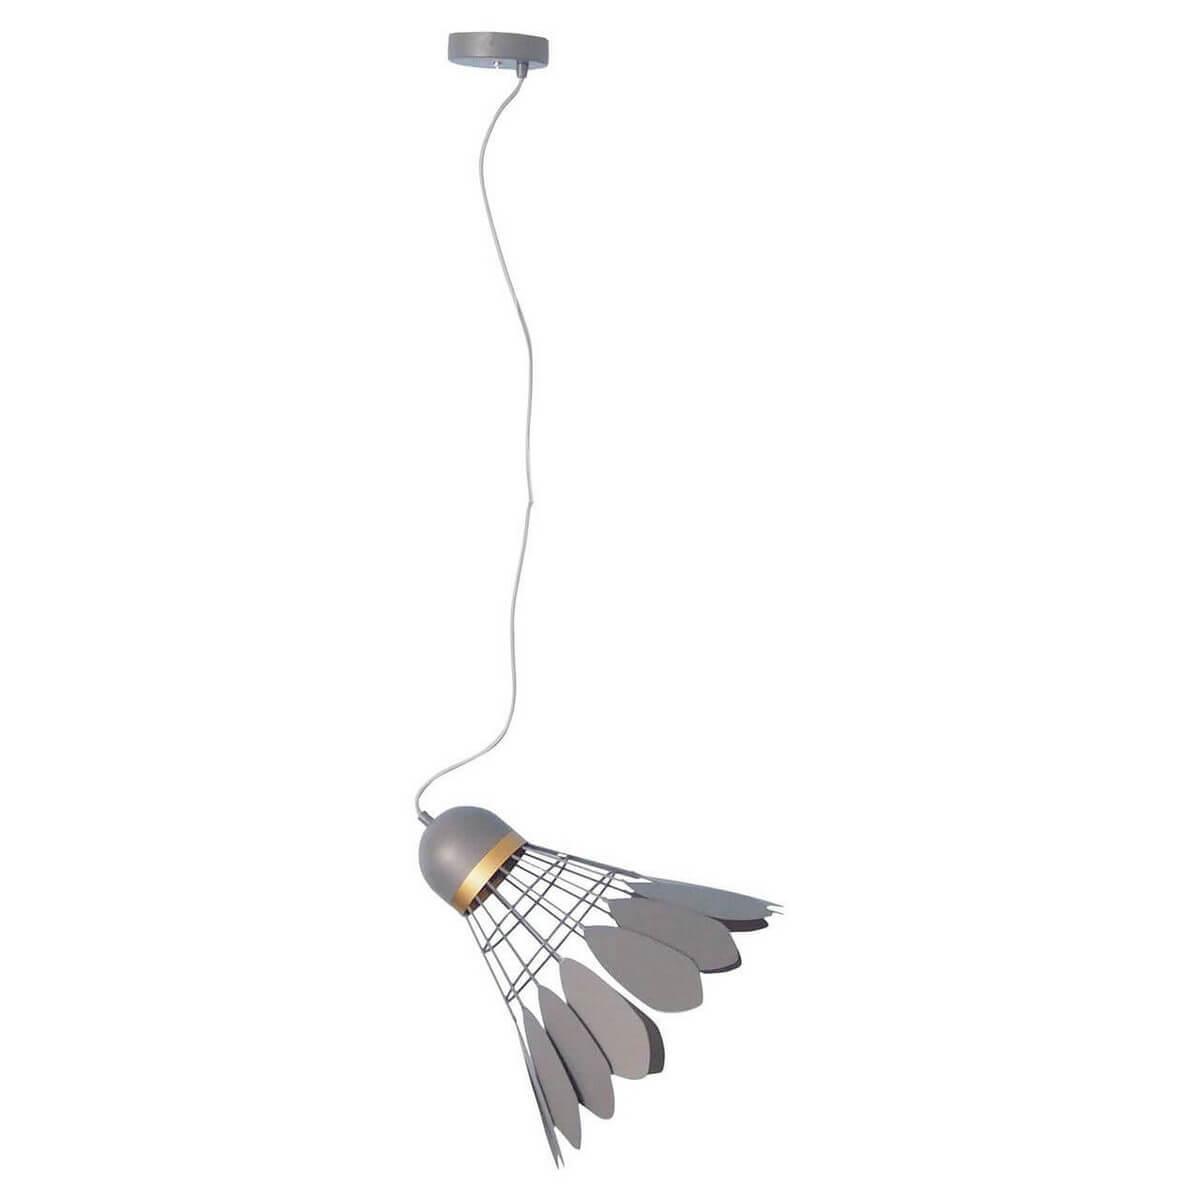 Светильник Lussole GRLSP-8070 Bristol подвесной светильник lussole loft bristol grlsp 8069